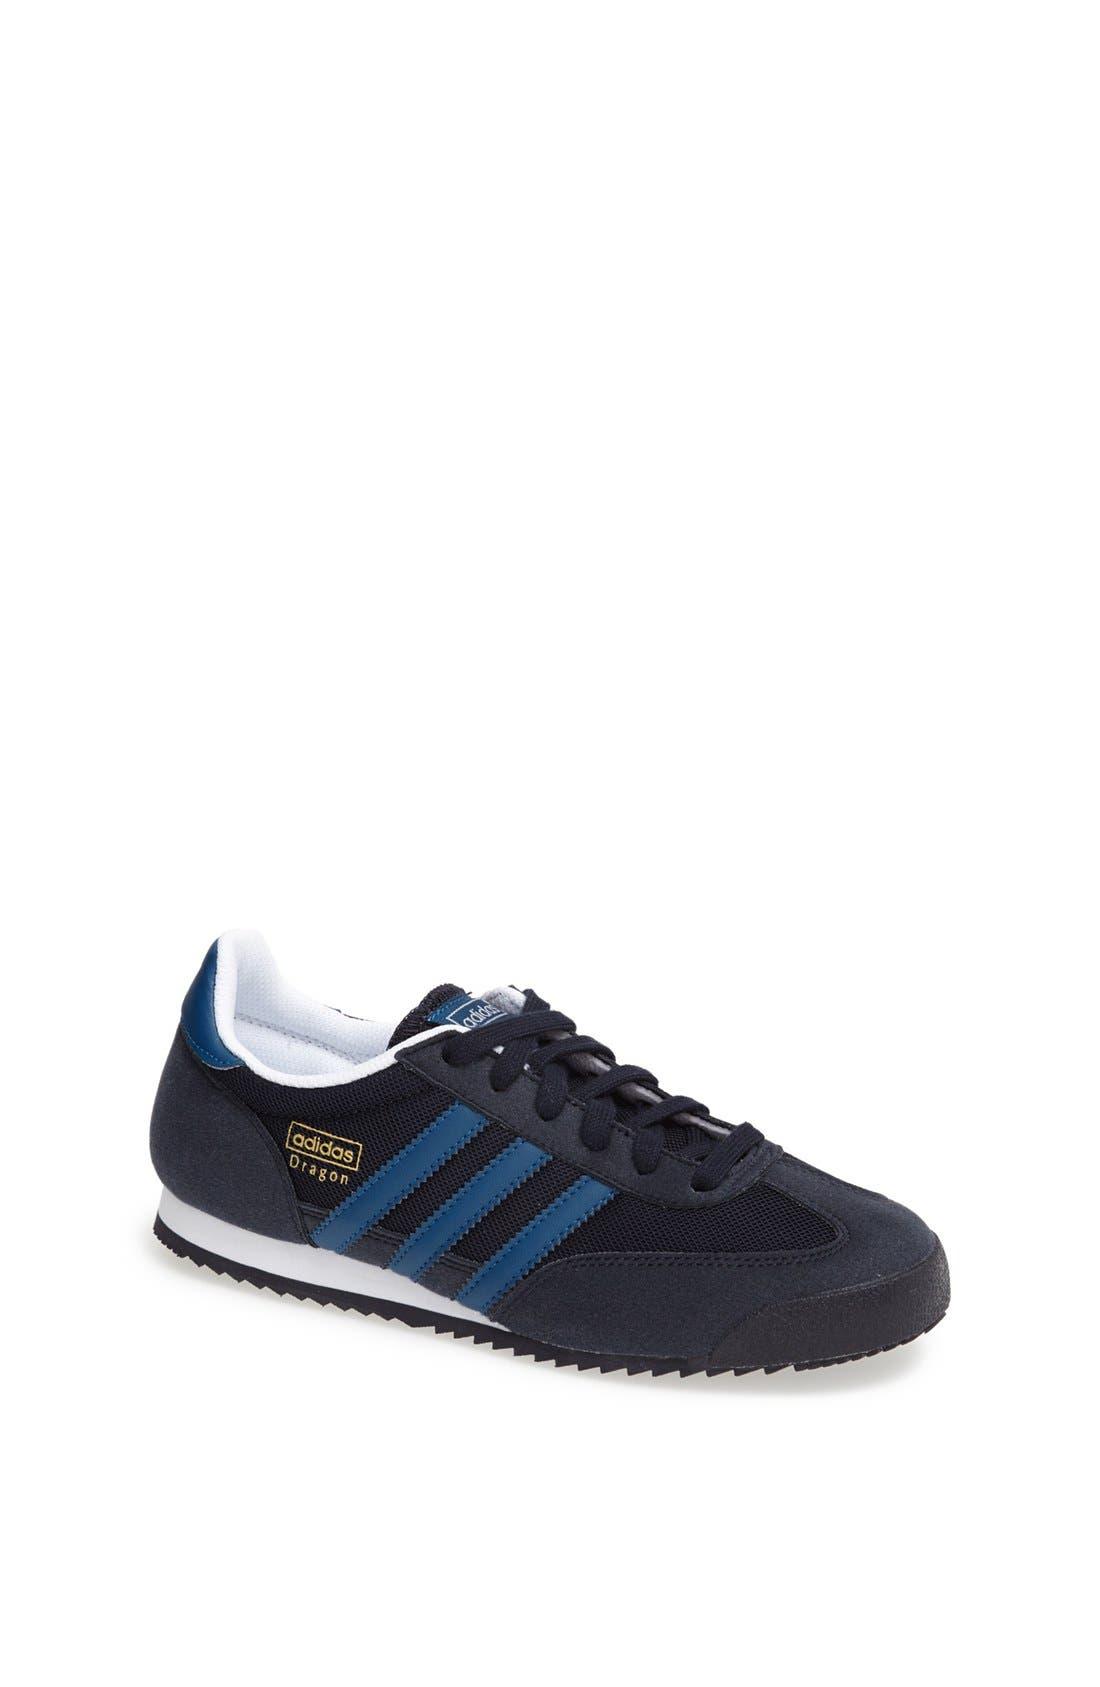 Main Image - adidas 'Dragon' Sneaker (Big Kid)